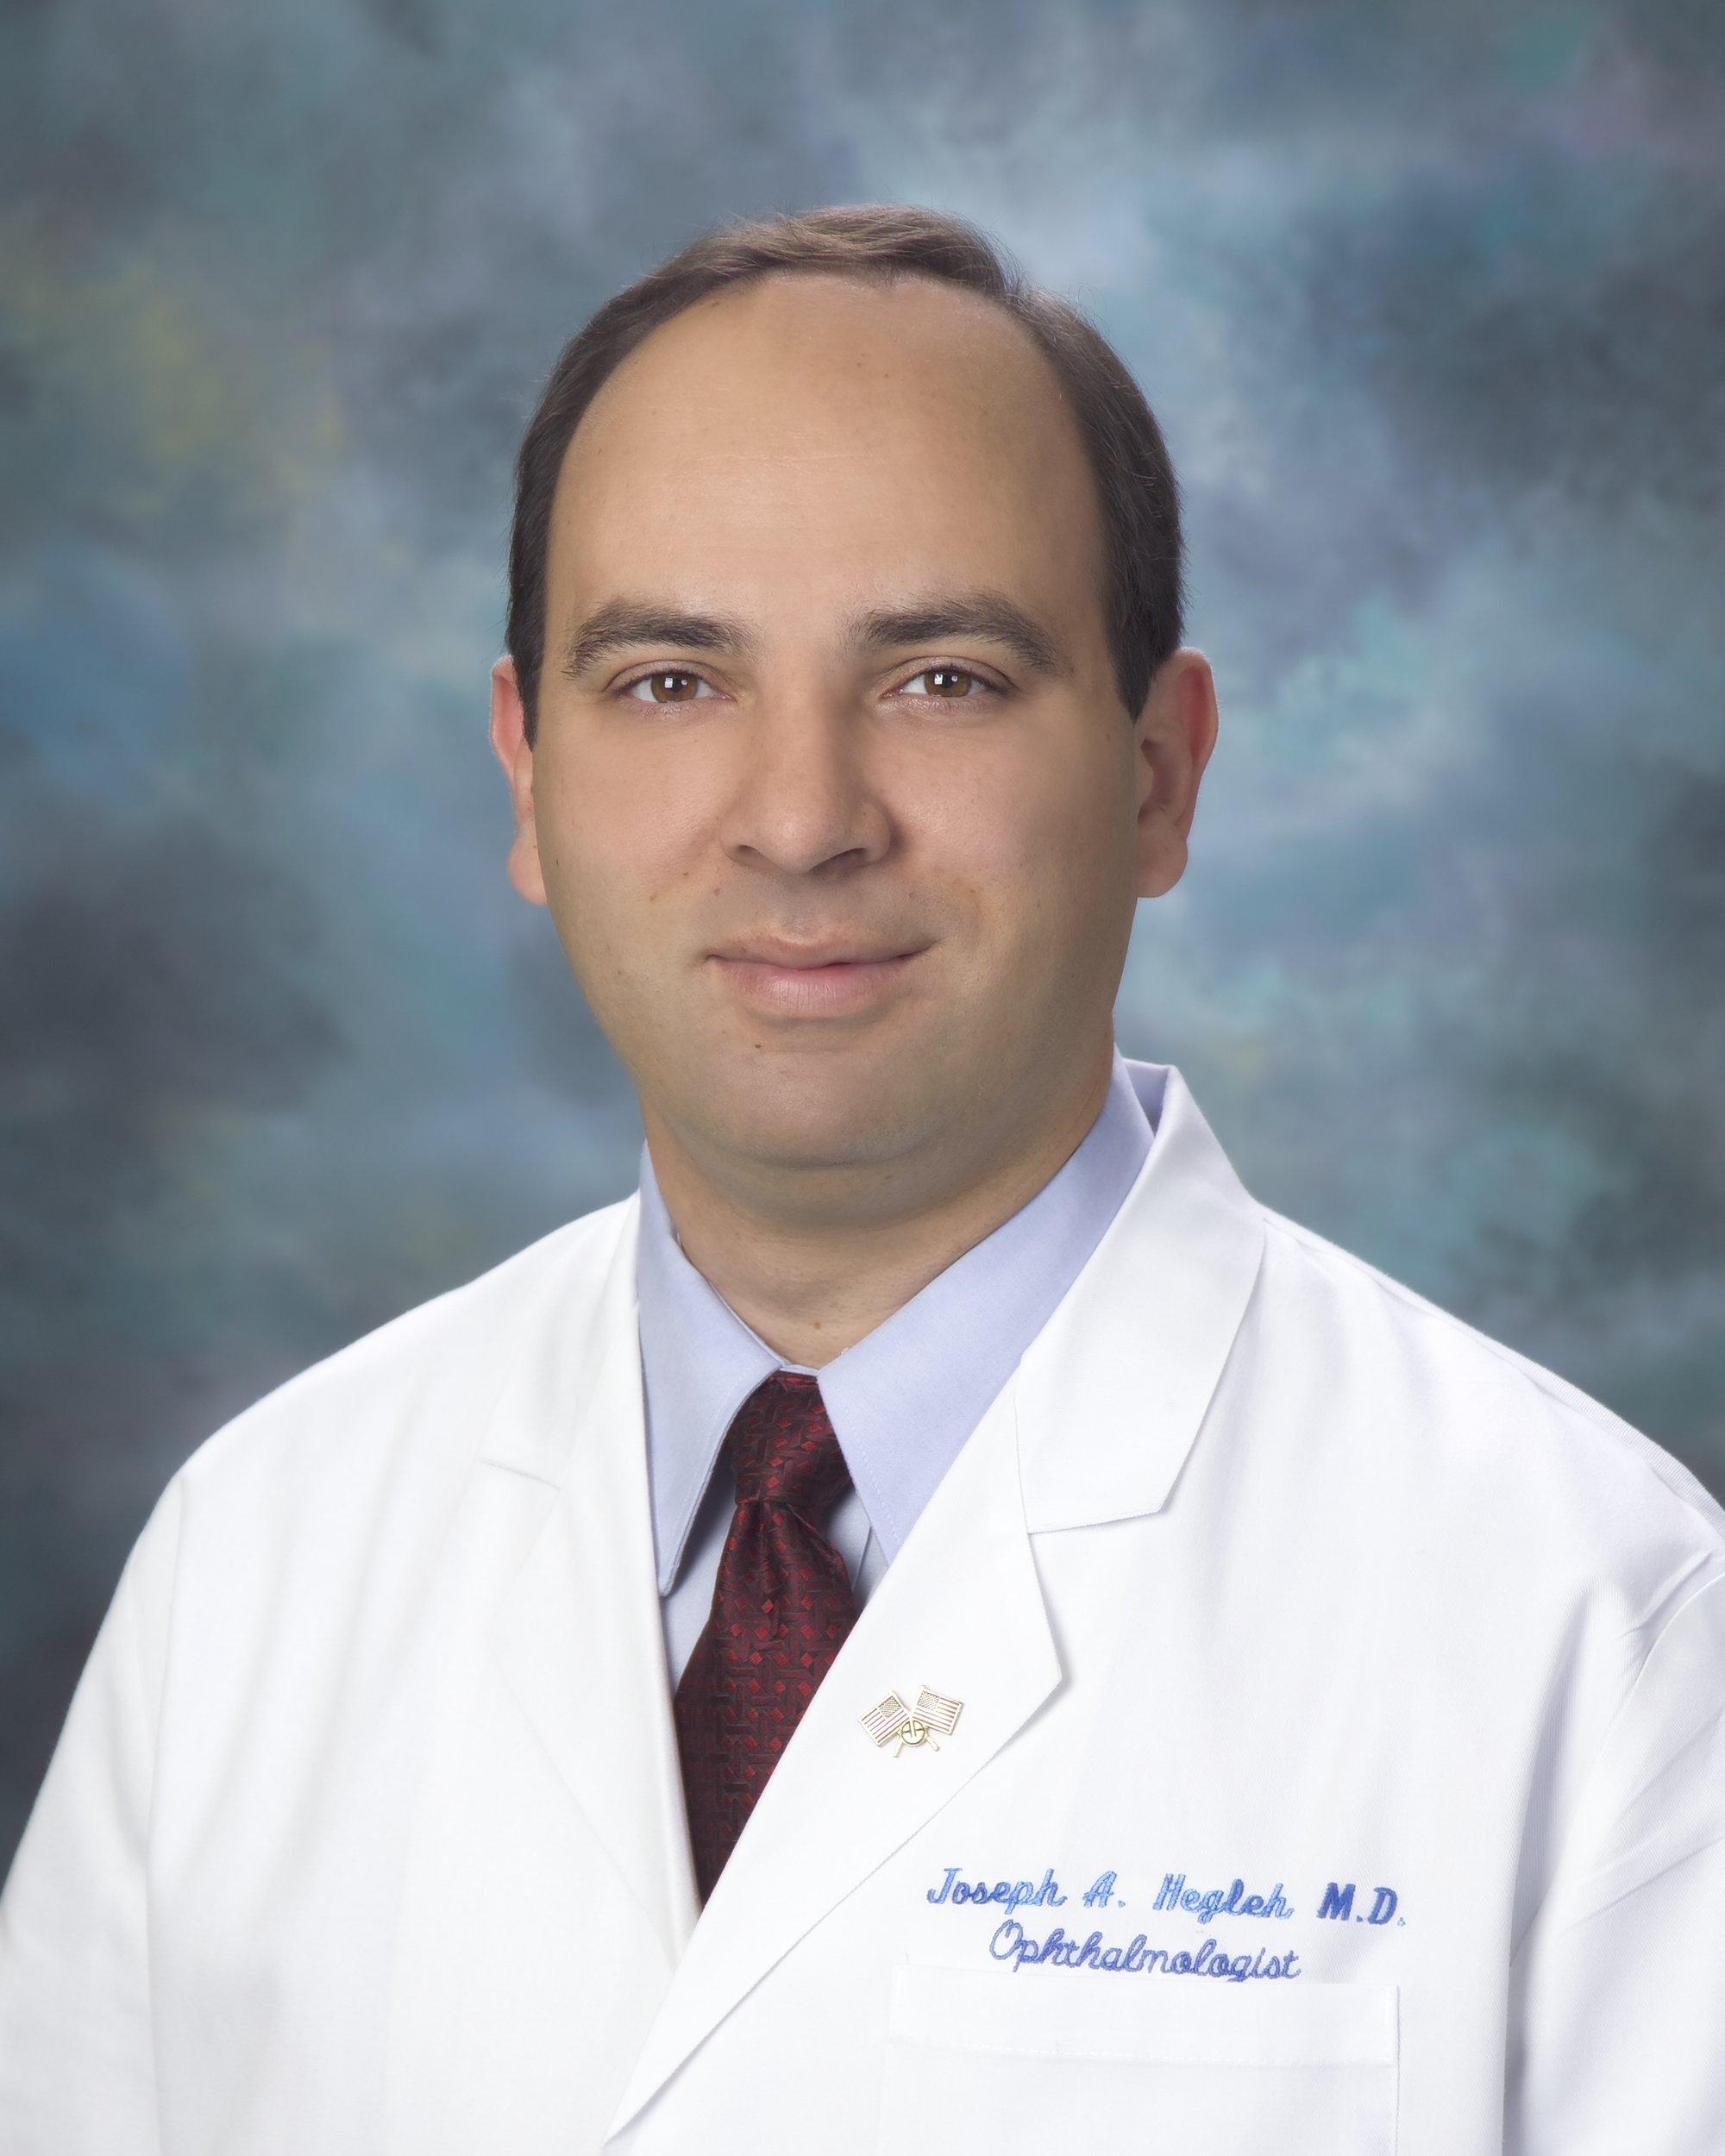 Sarasota County Medical Society